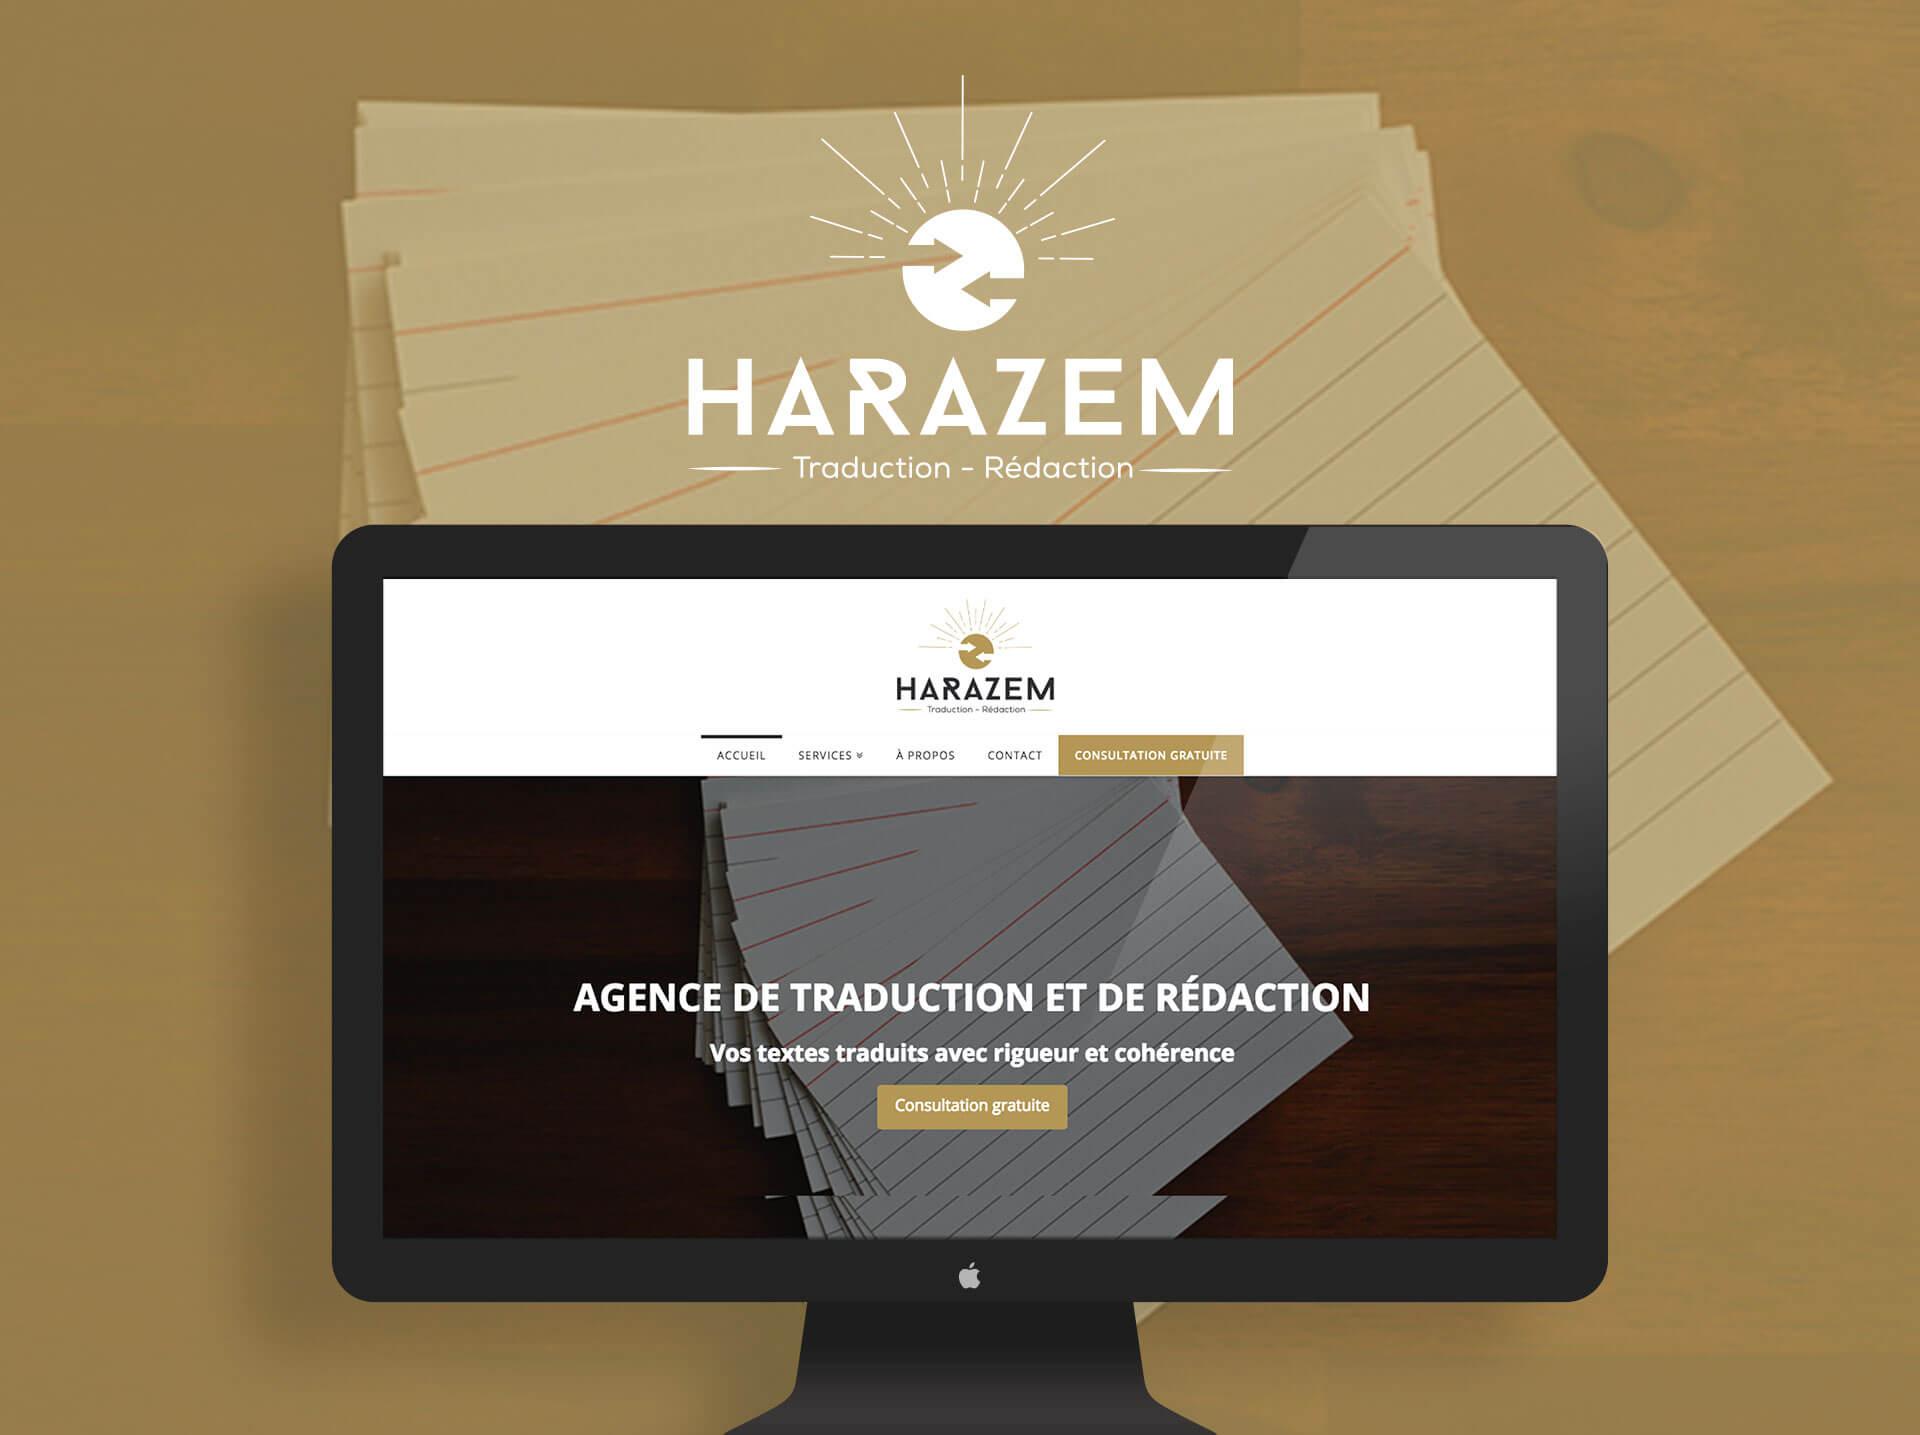 Harazm